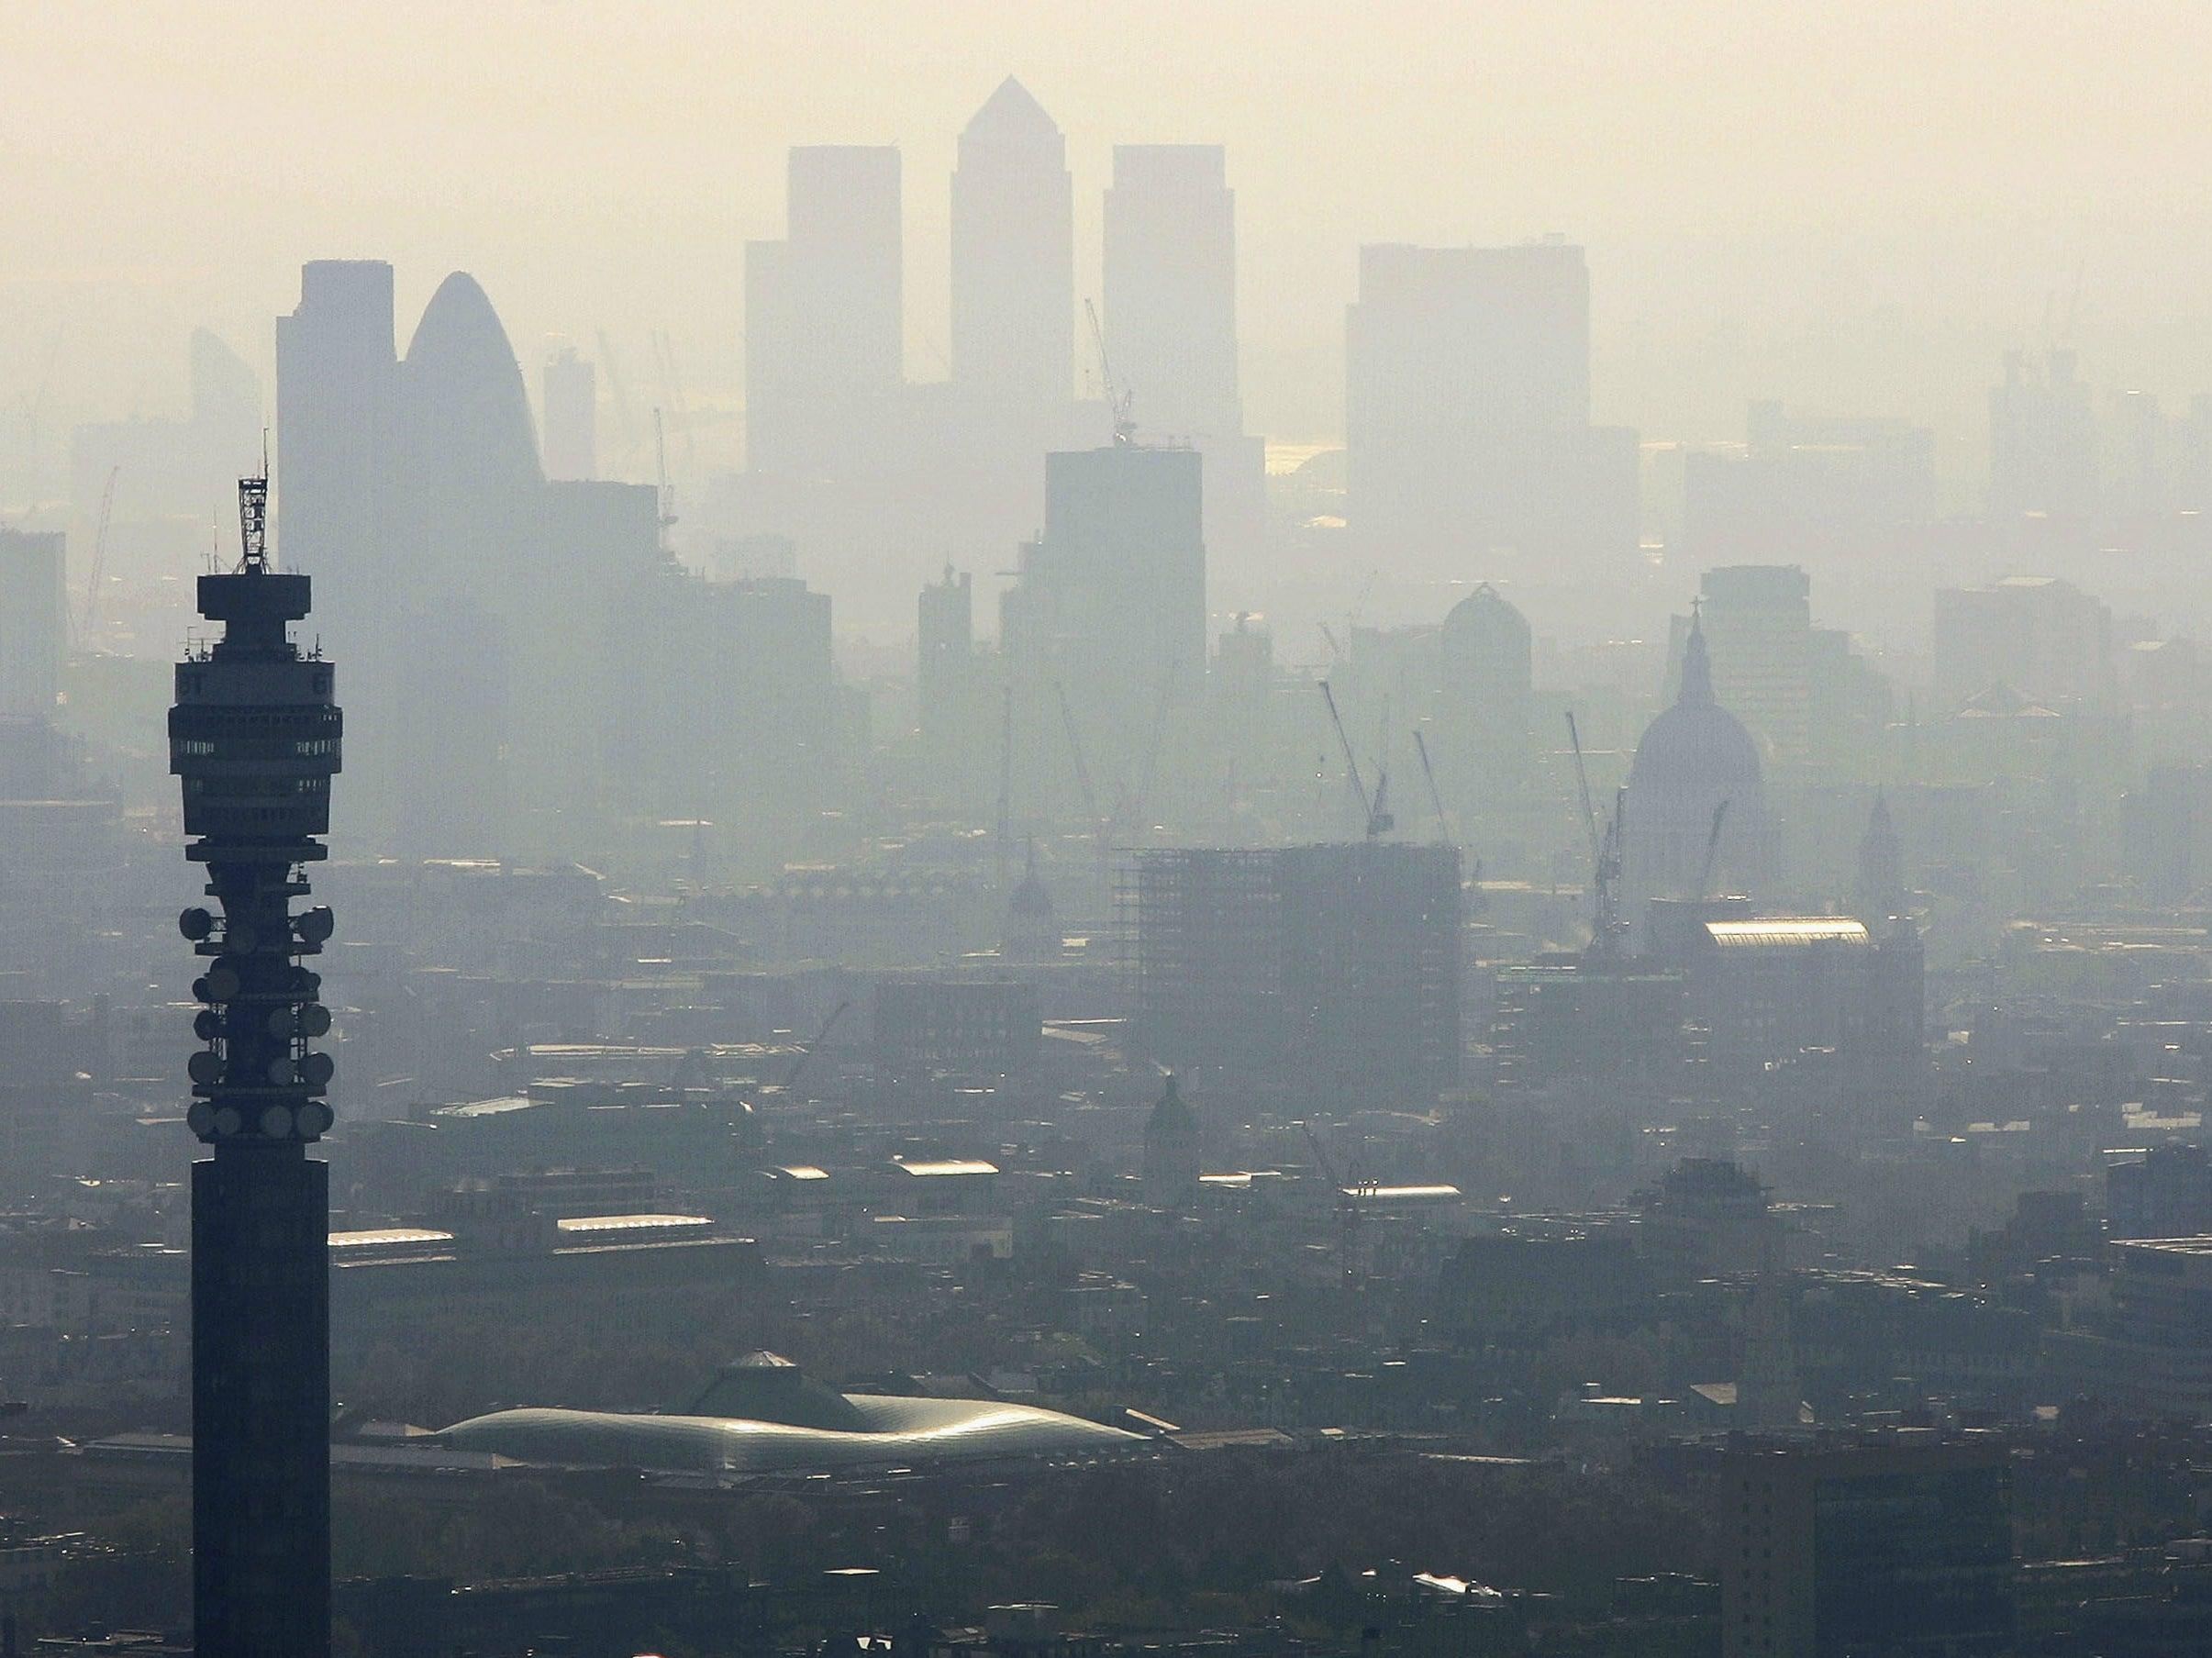 Breathing London air same as smoking 150 cigarettes a year, experts warn